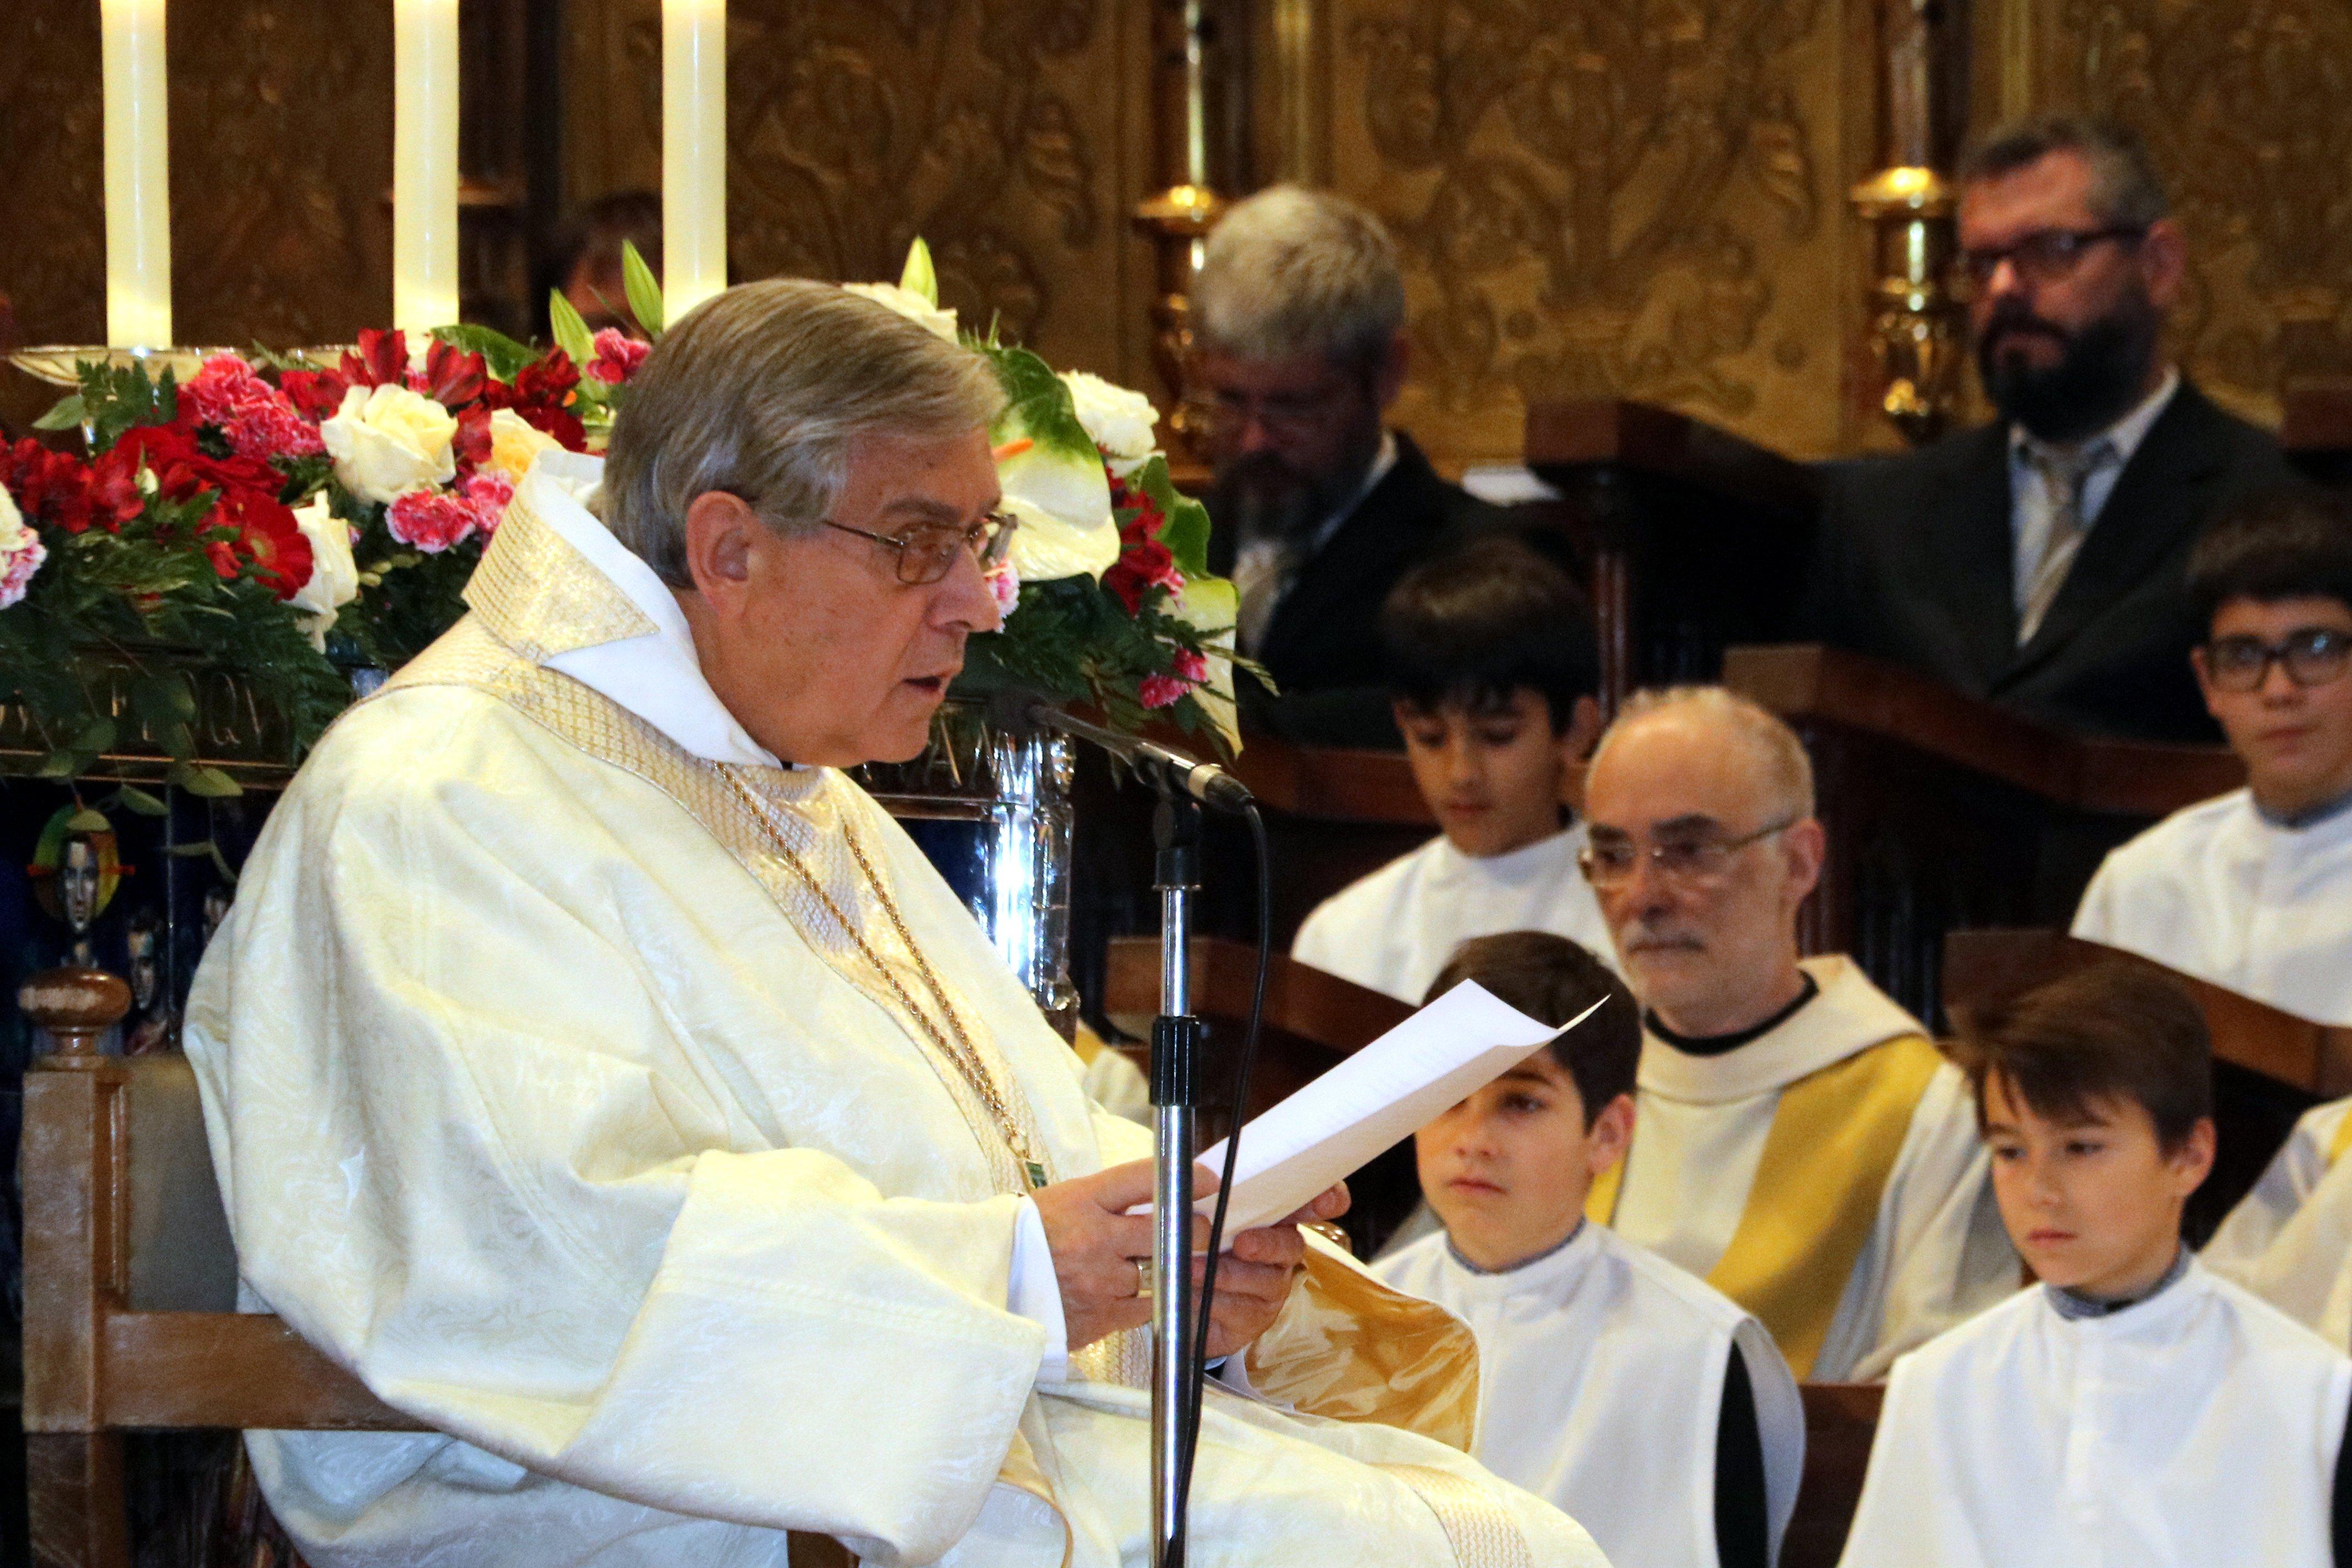 pare abat de Montserrat Josep Maria Soler ACN